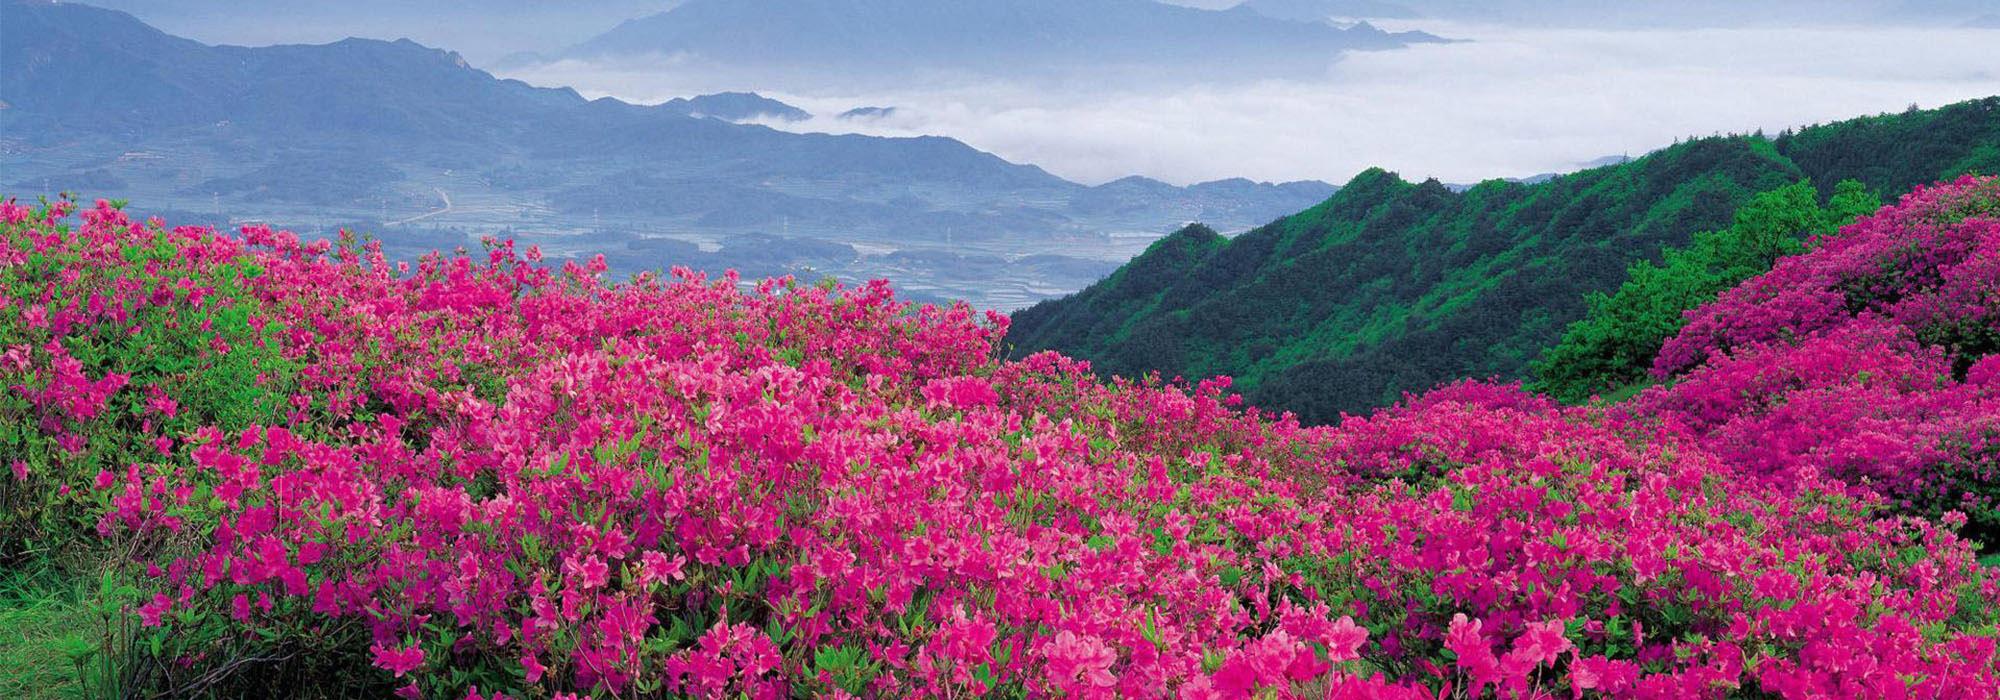 Bhutan Rhododendron festival